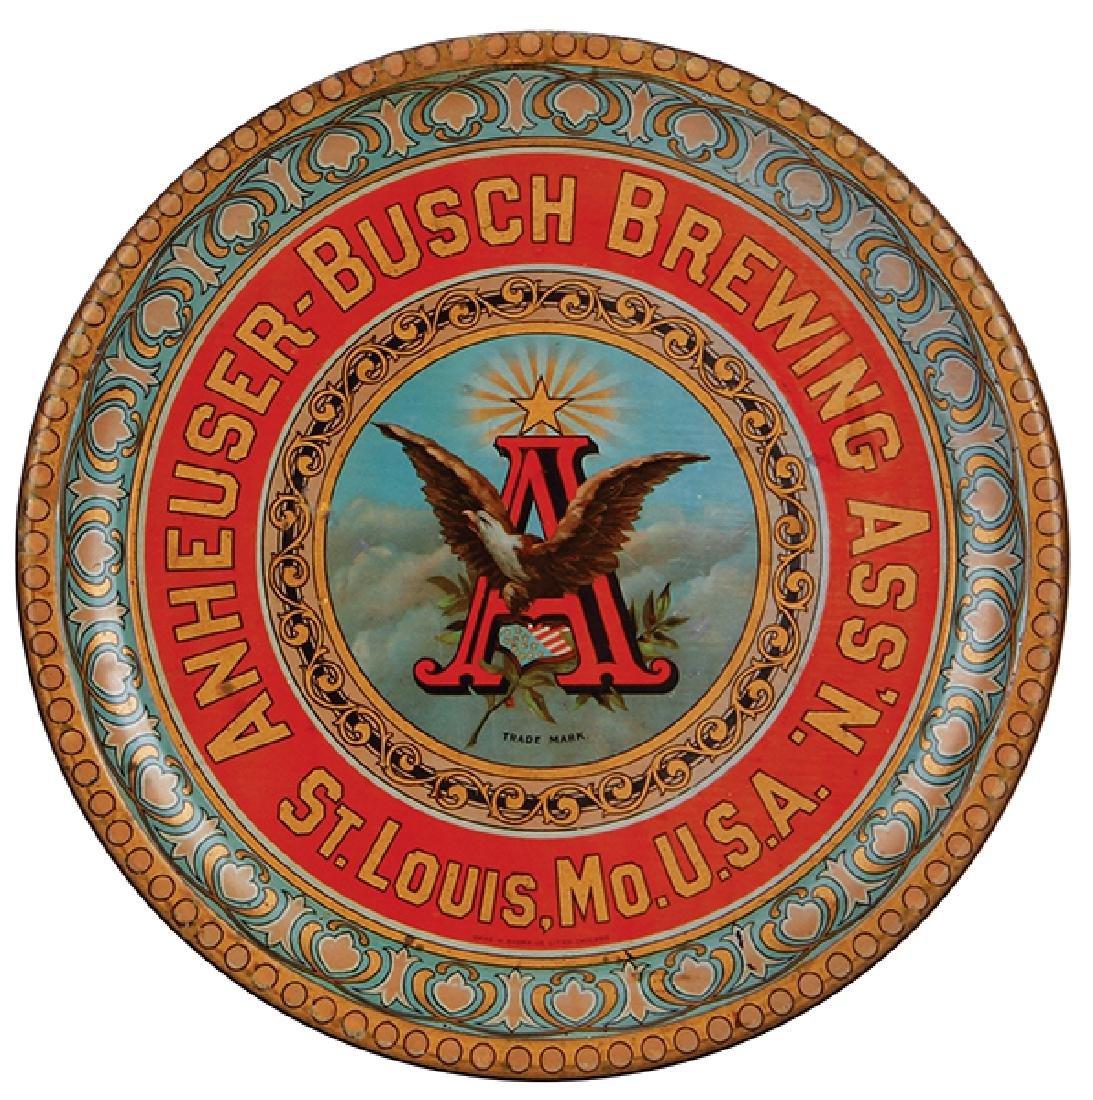 Anheuser-Busch tray